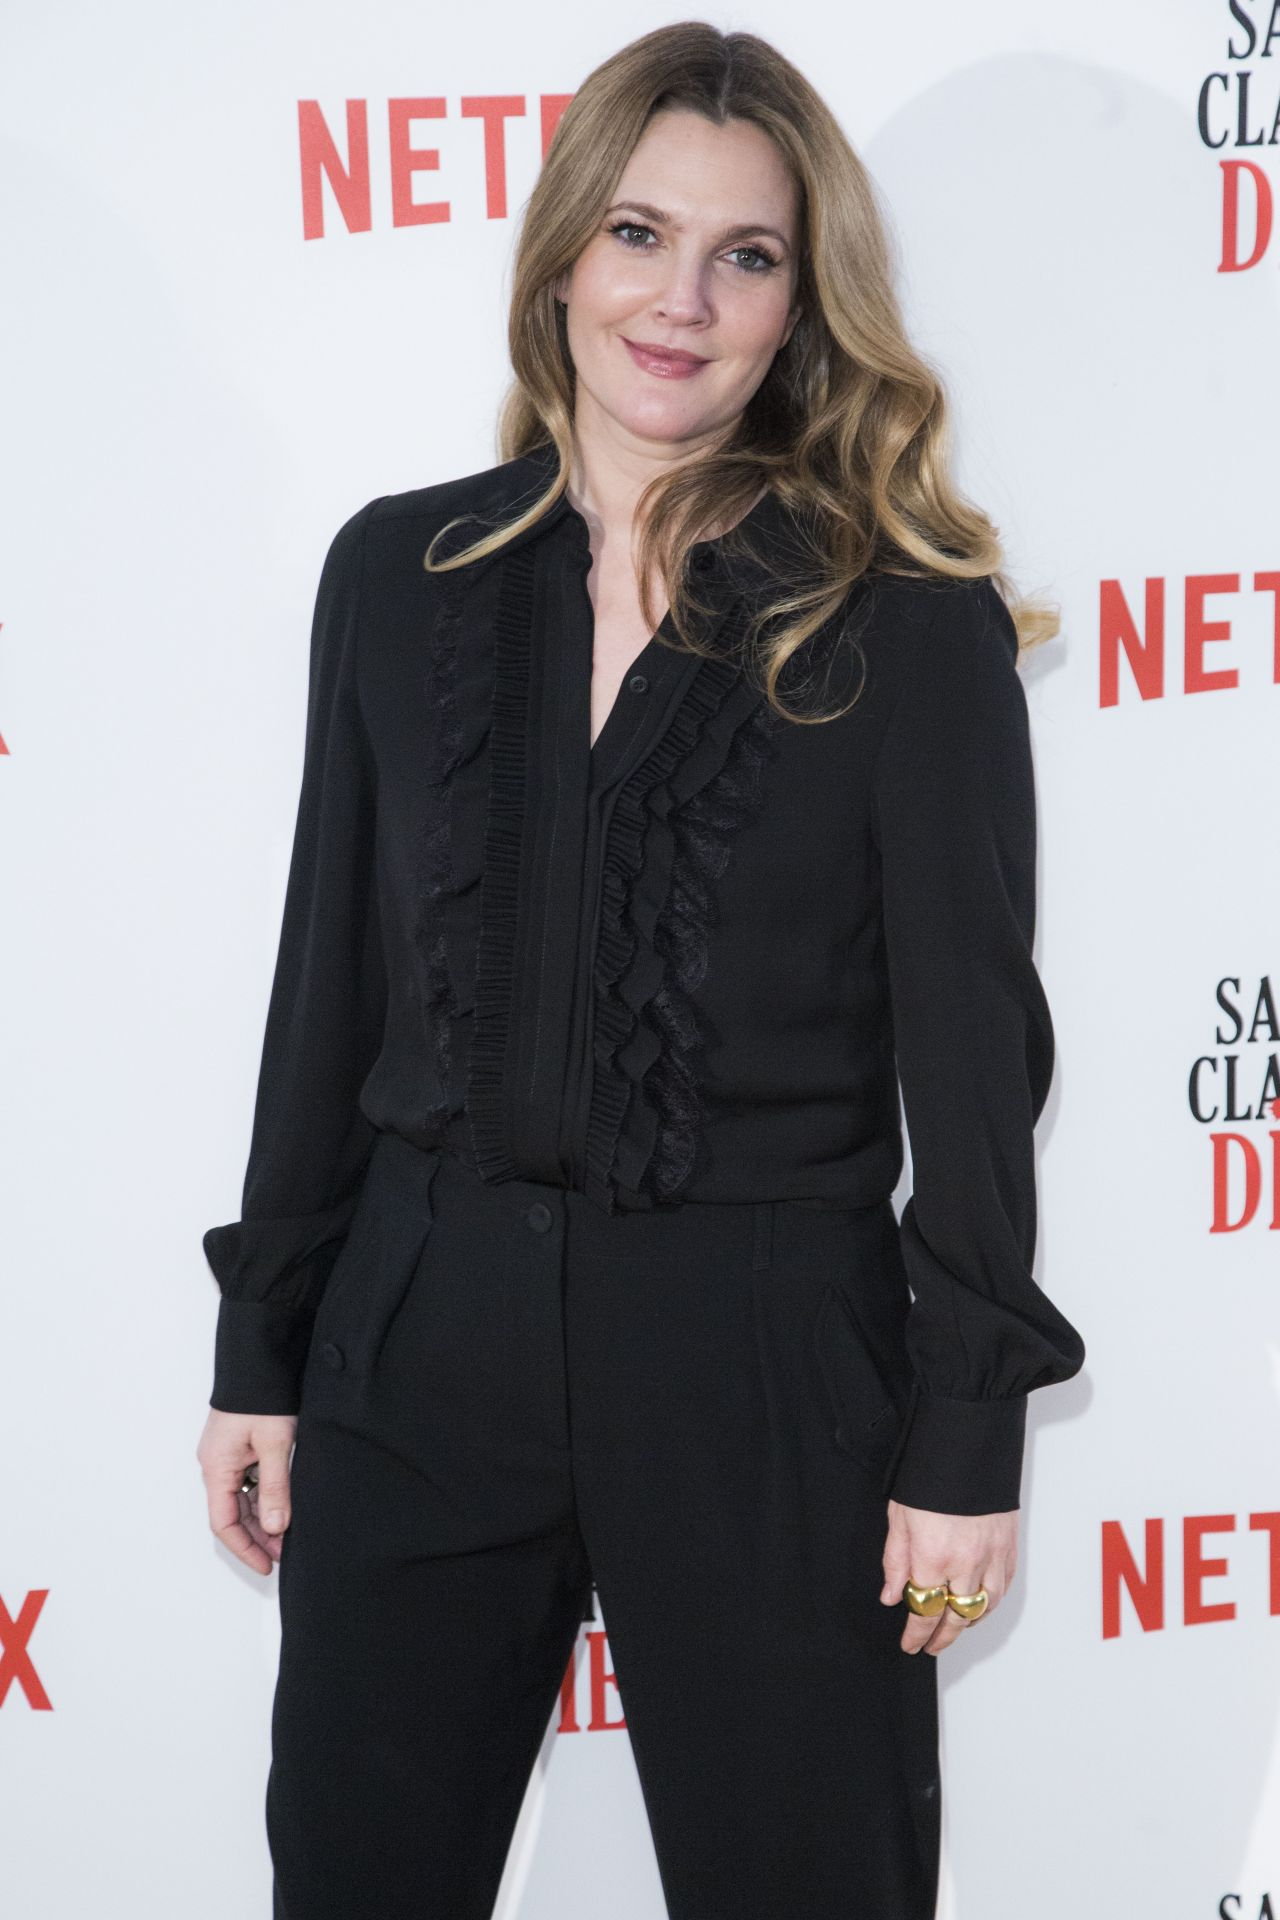 Drew Barrymore - Santa Clarita Diet TV Show Photocall in ... Drew Barrymore